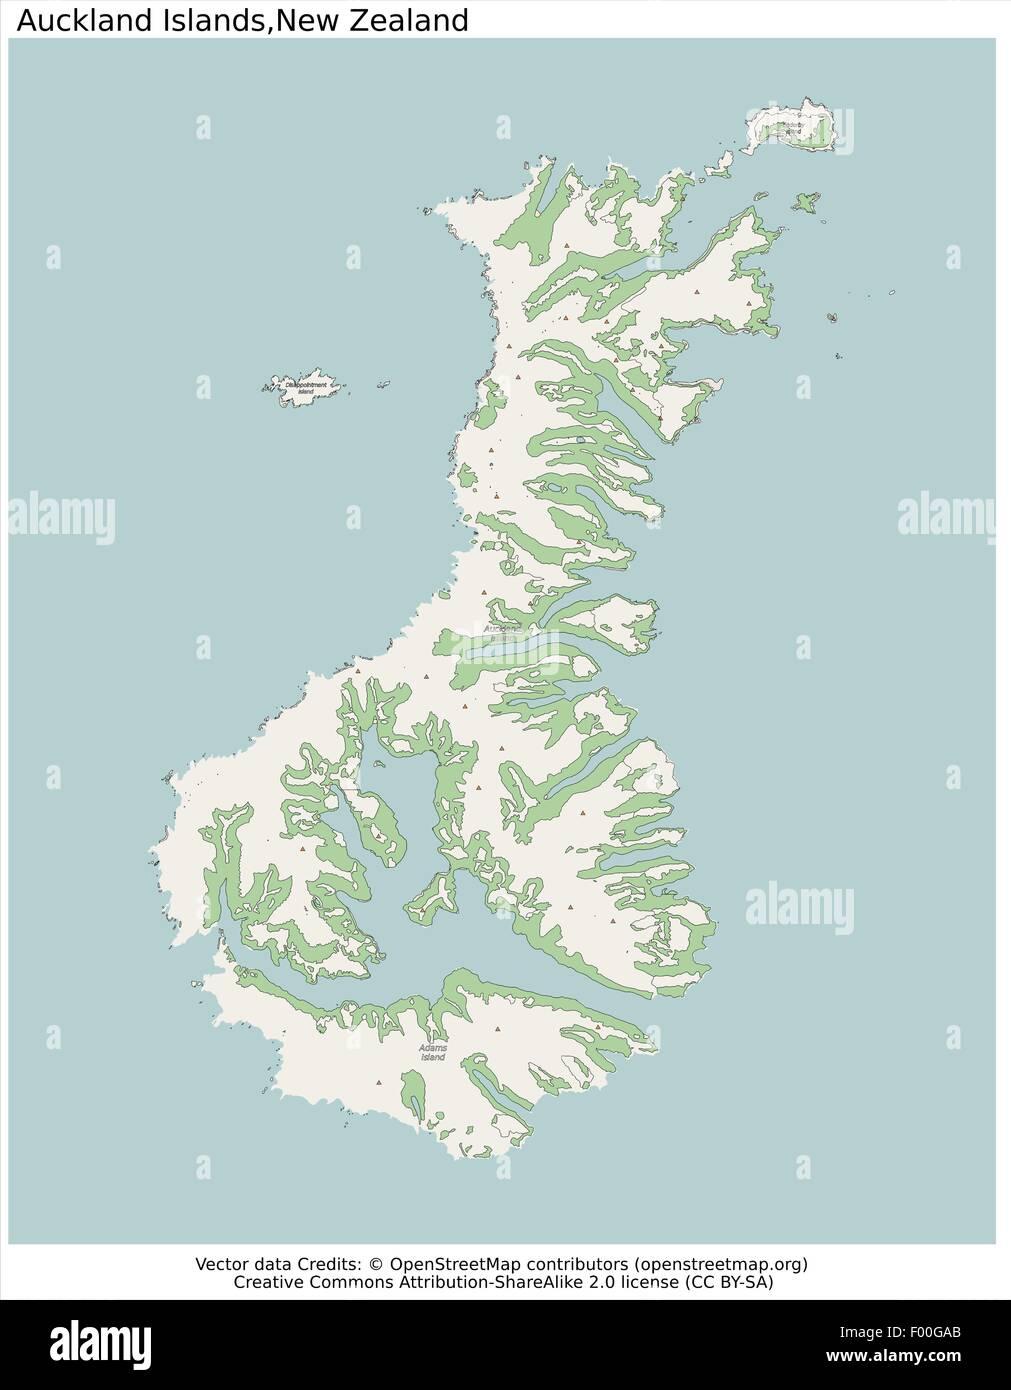 Auckland Islands New Zealand map Stock Vector Art & Illustration ...